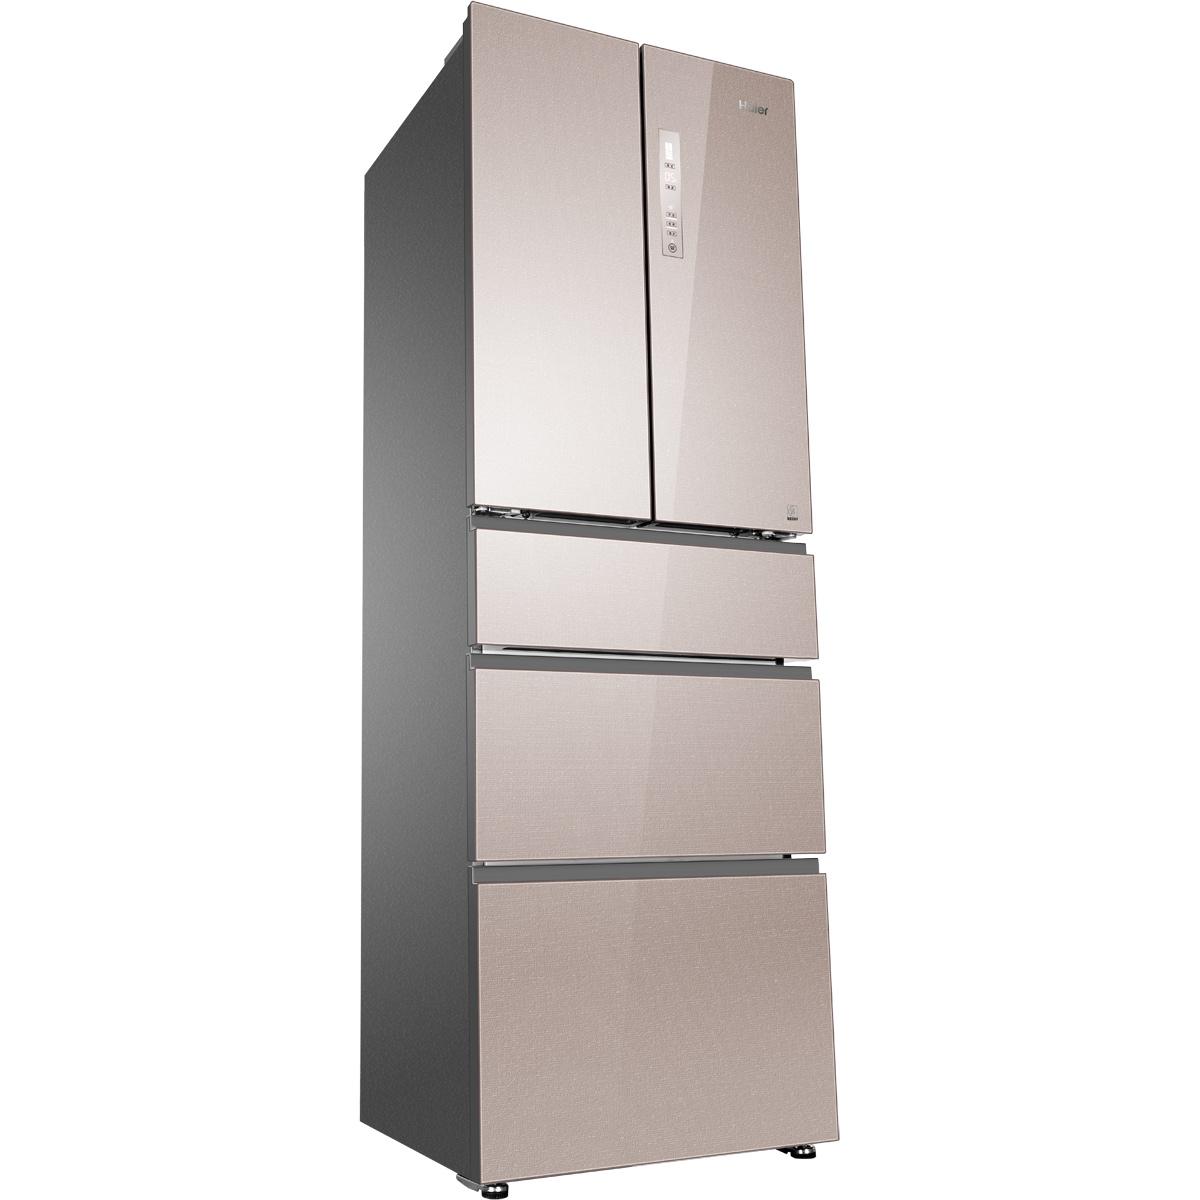 Haier/海尔             冰箱             BCD-350WDCM